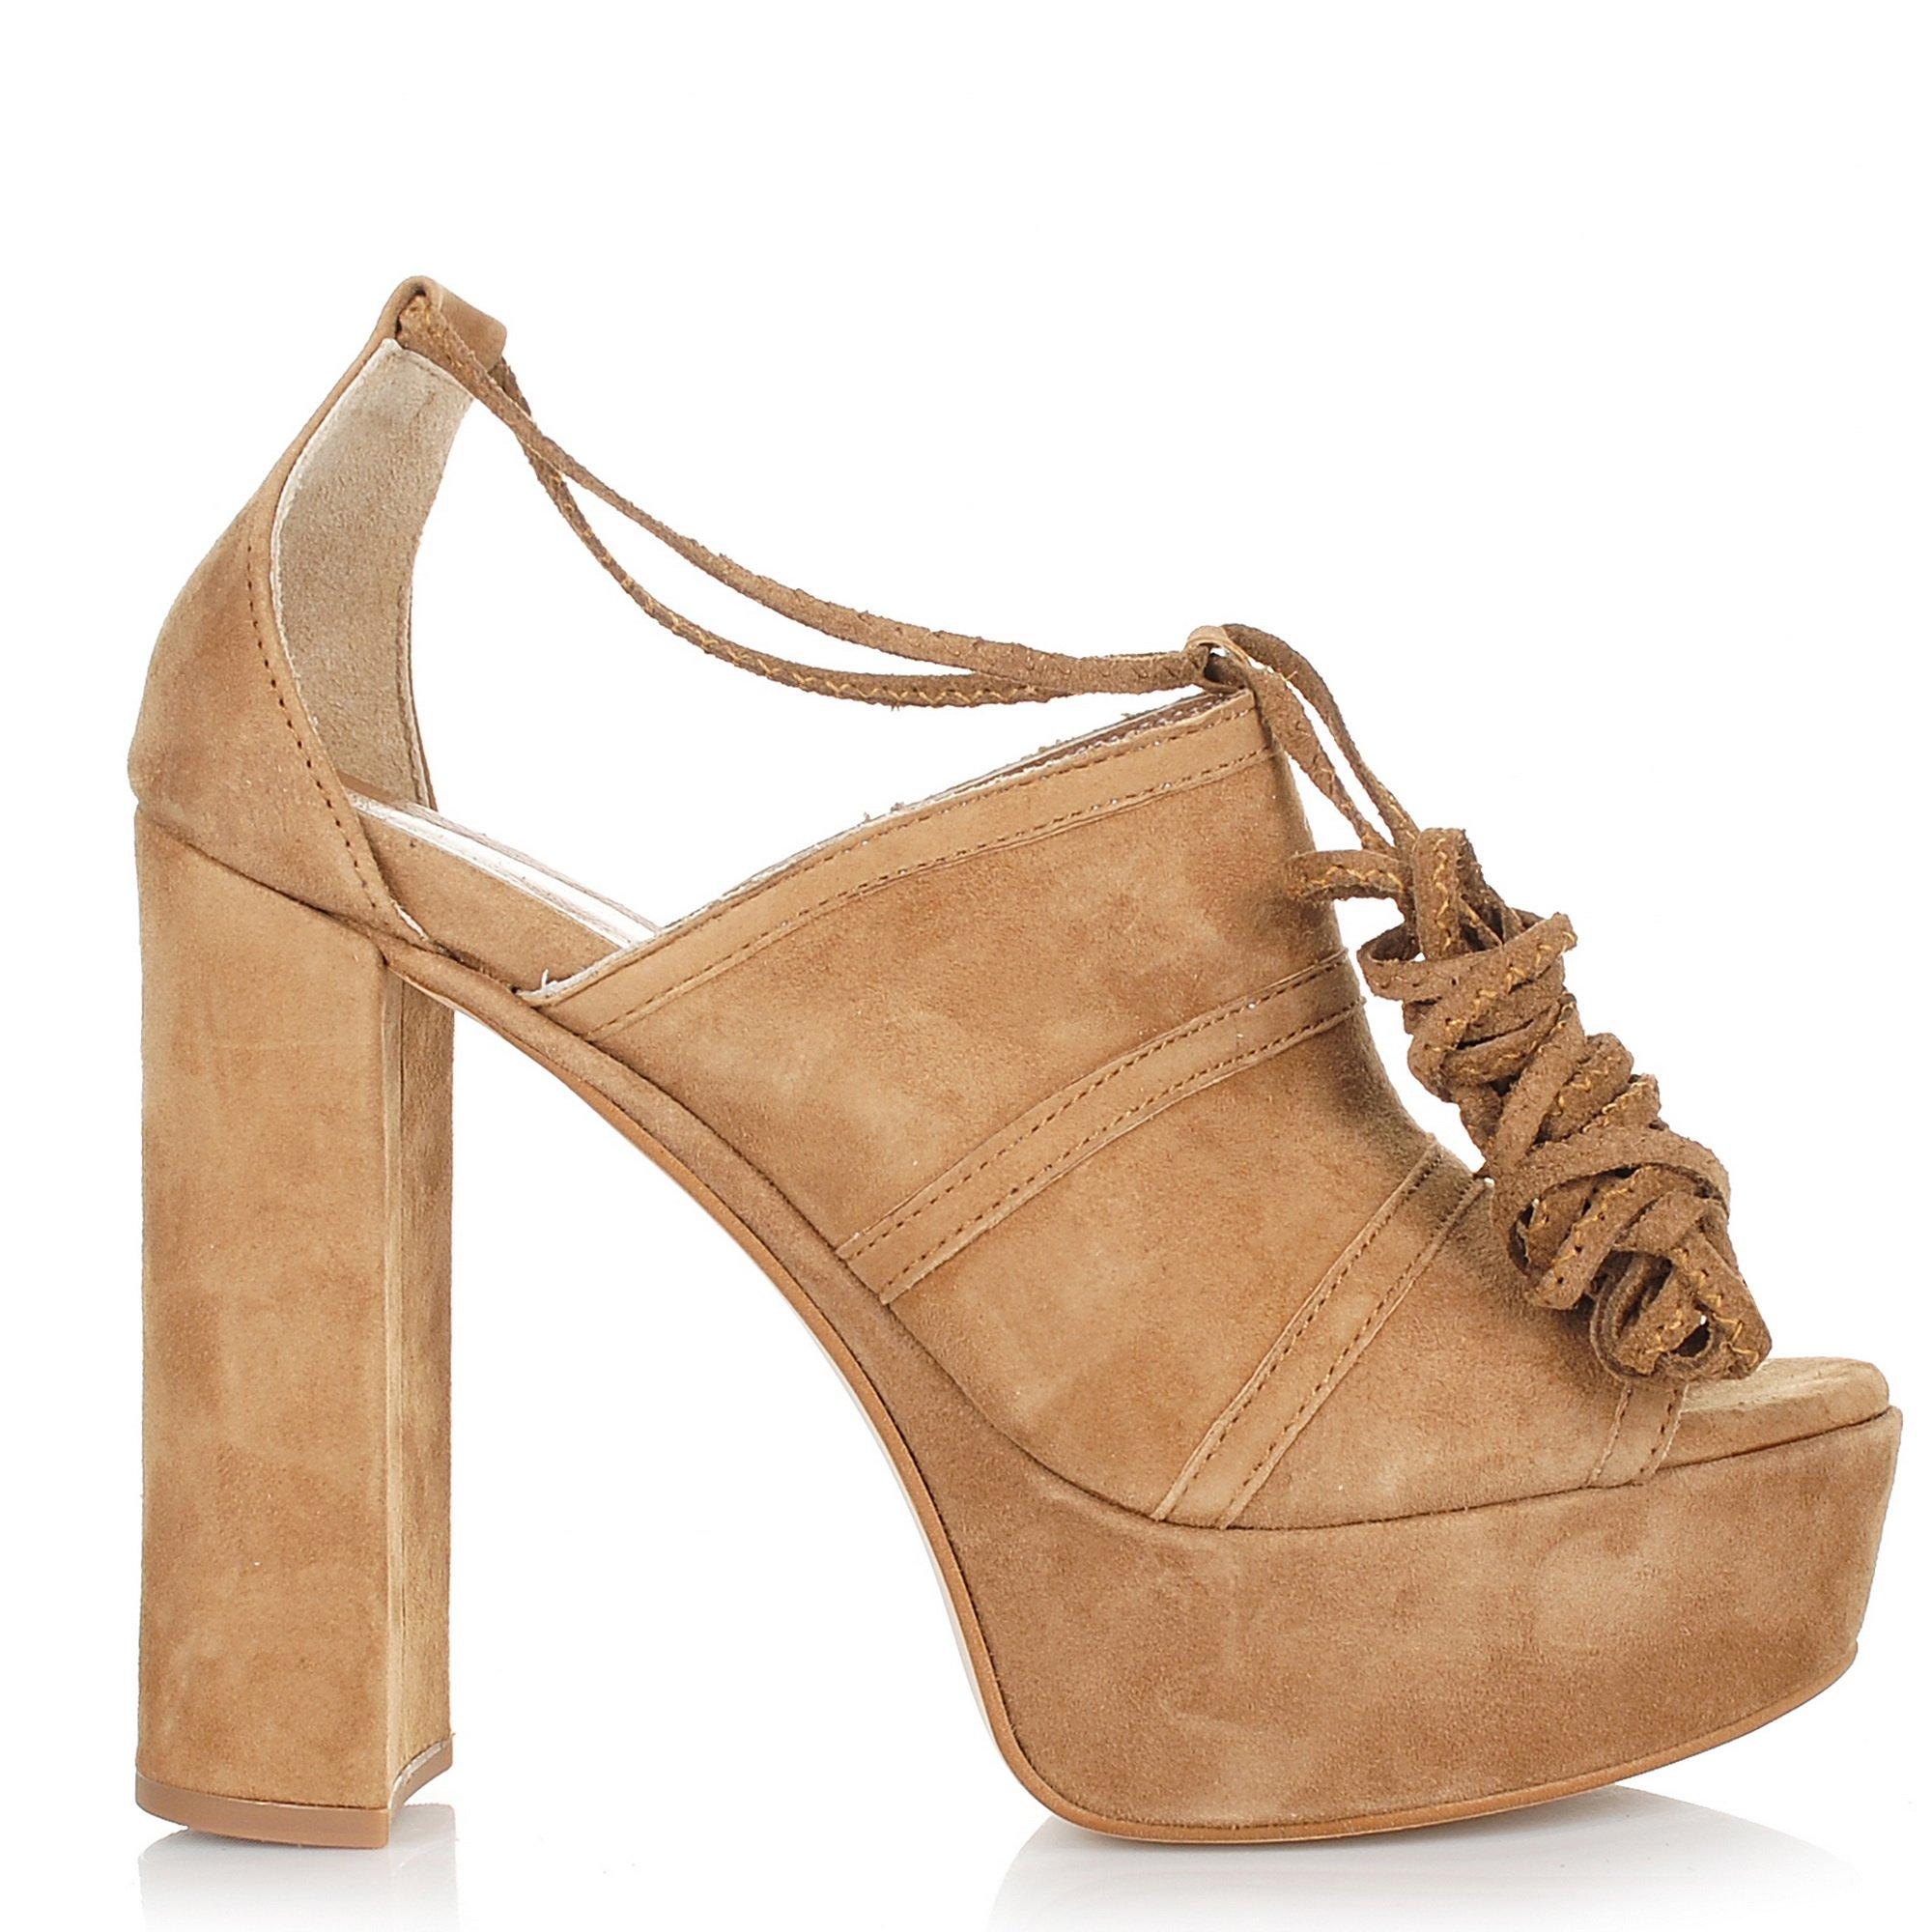 Suede Δερμάτινα Πέδιλα Nitro Fashion SX1086M γυναικα   γυναικείο παπούτσι